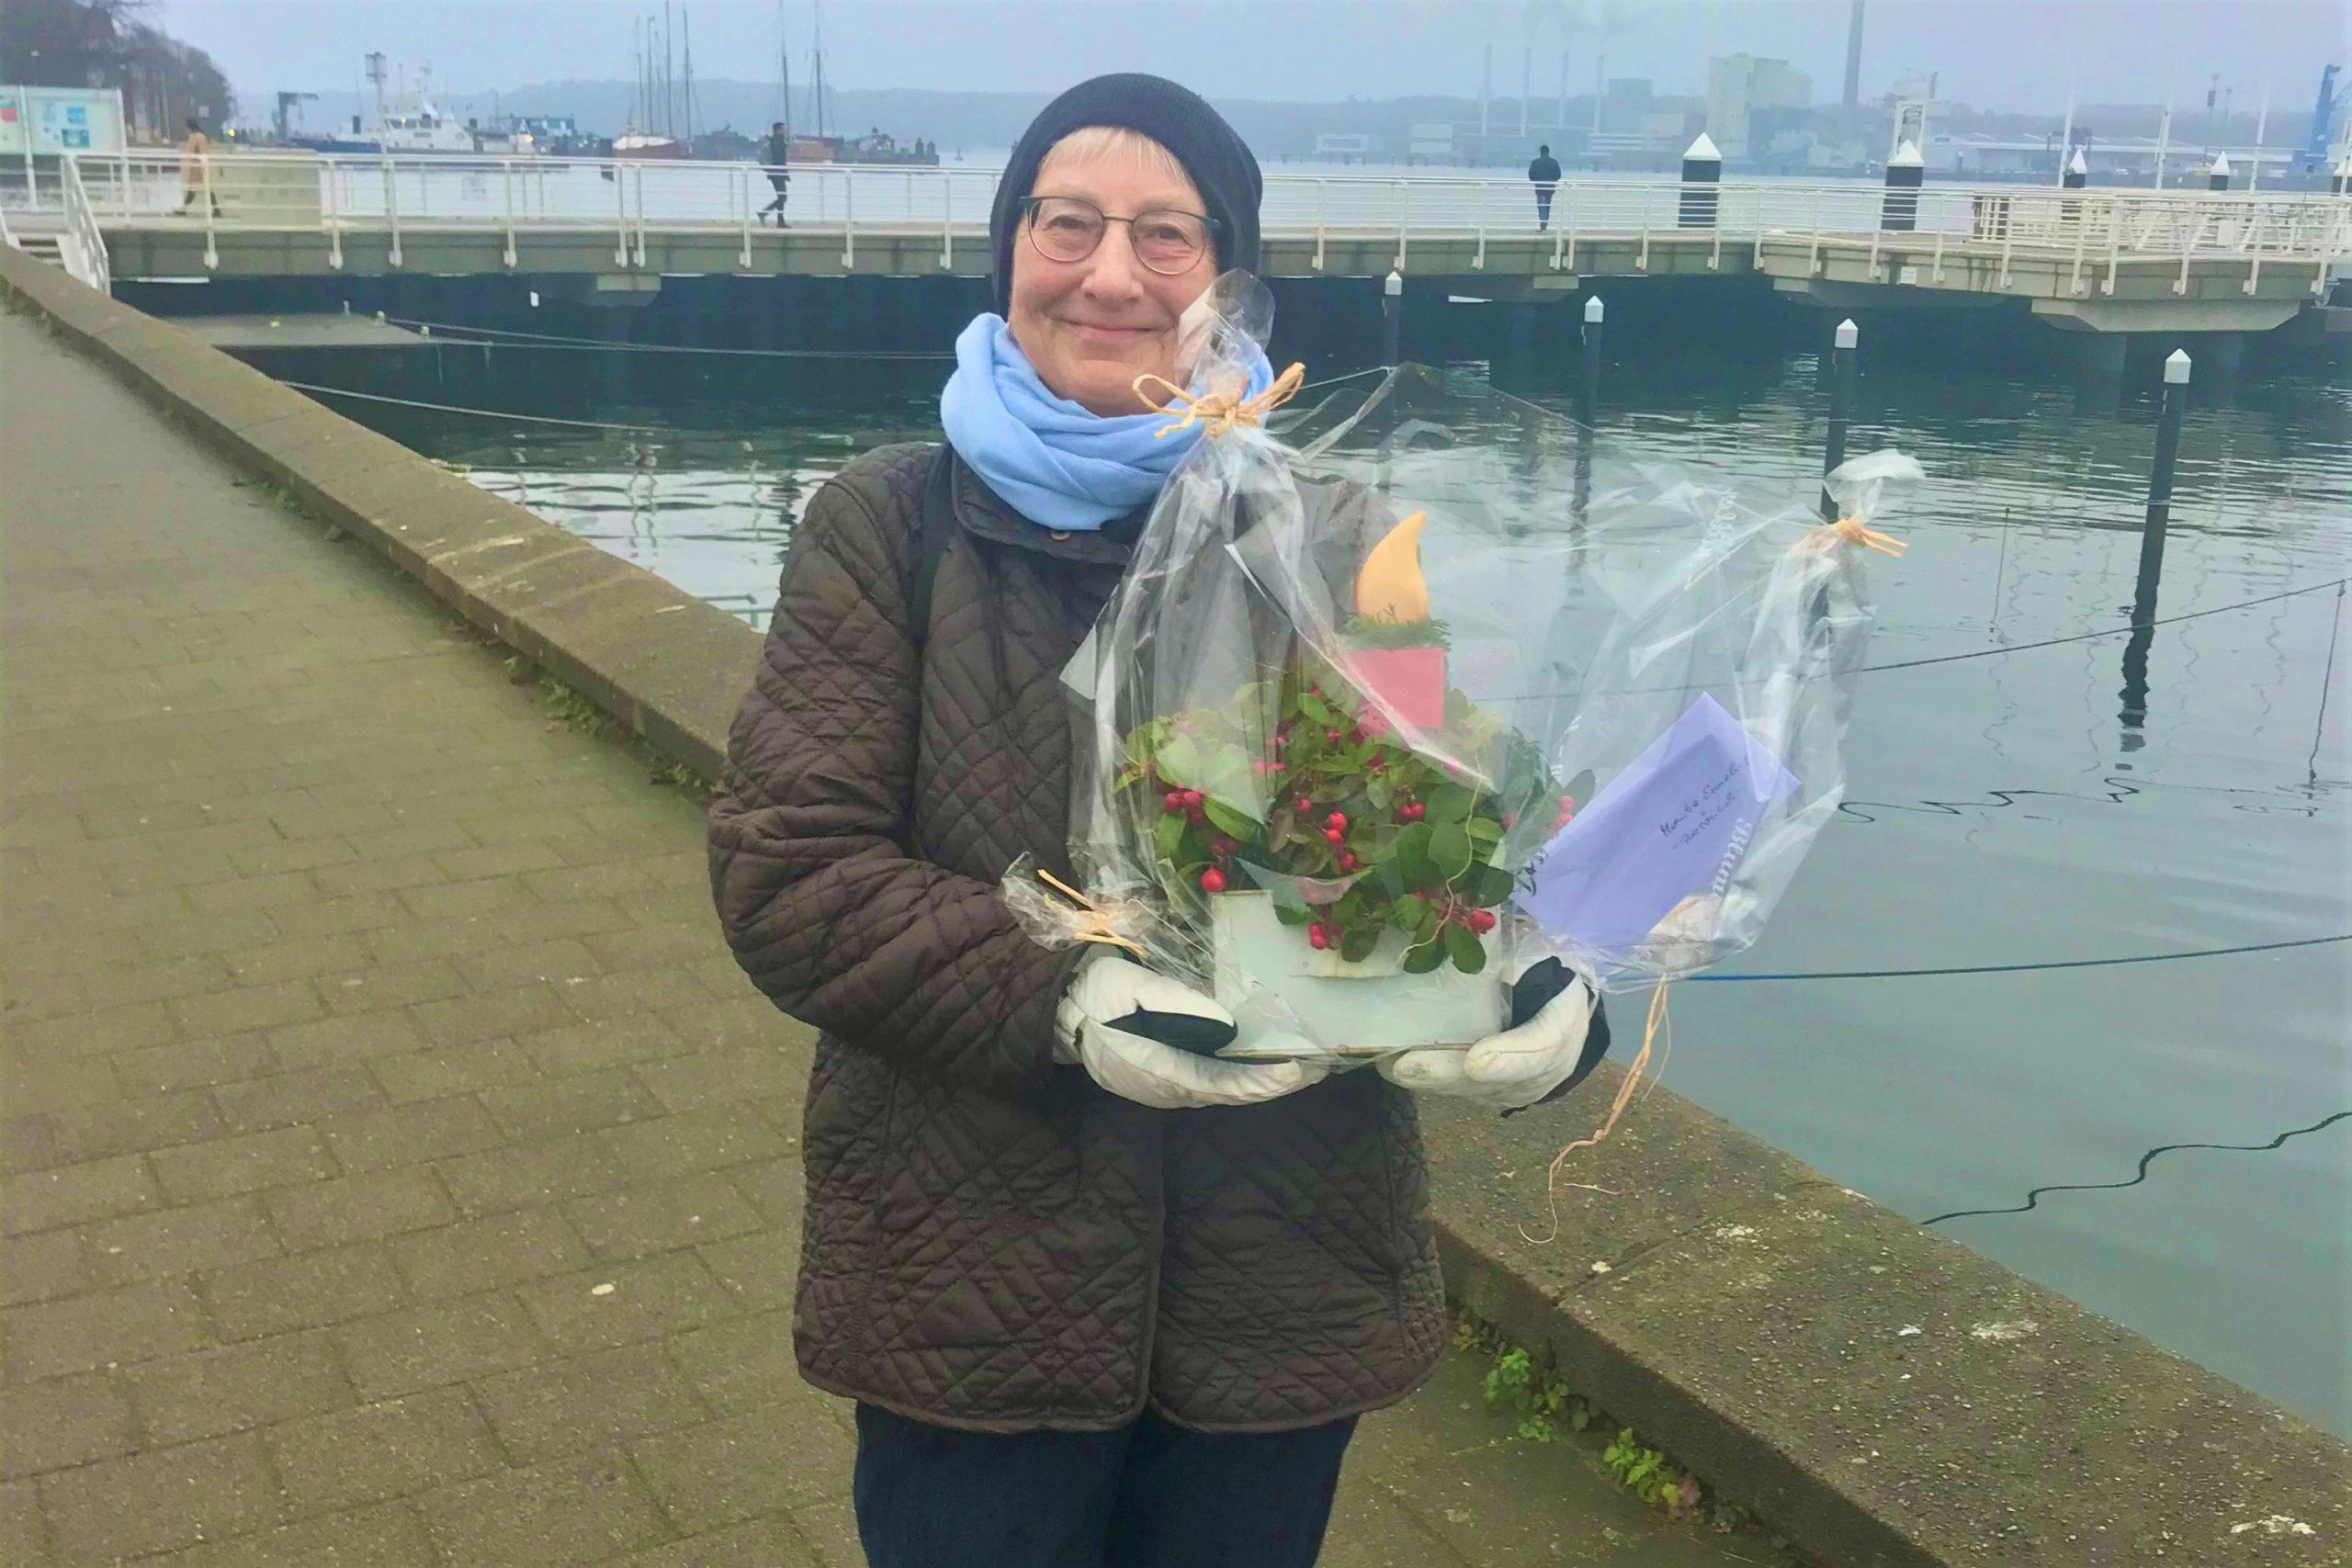 Monika Ermeling Mit Blumengesteck